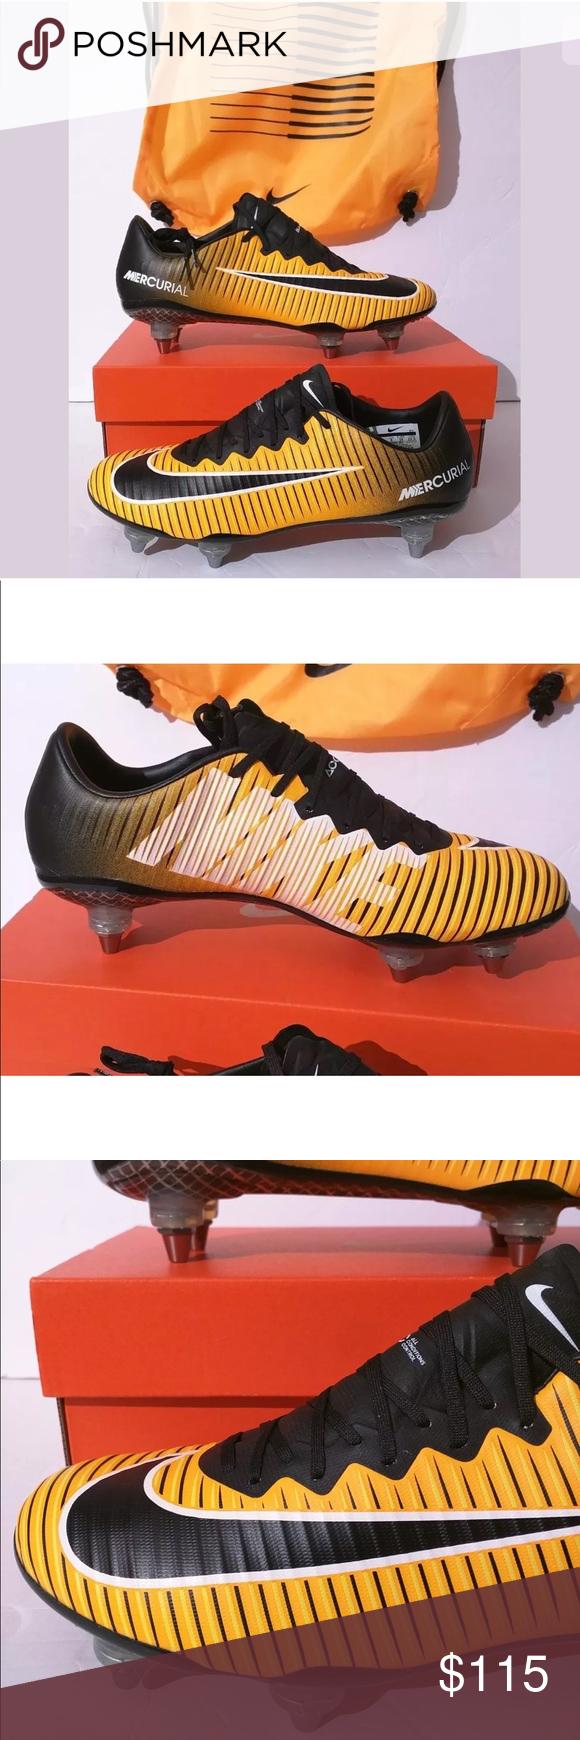 Black White · Model · Orange · Nike Mercurial Vapor XI SG Promo Soccer  ShoeCleats New Nike Mercurial Vapor XI SG Promo Made 45682d030f7